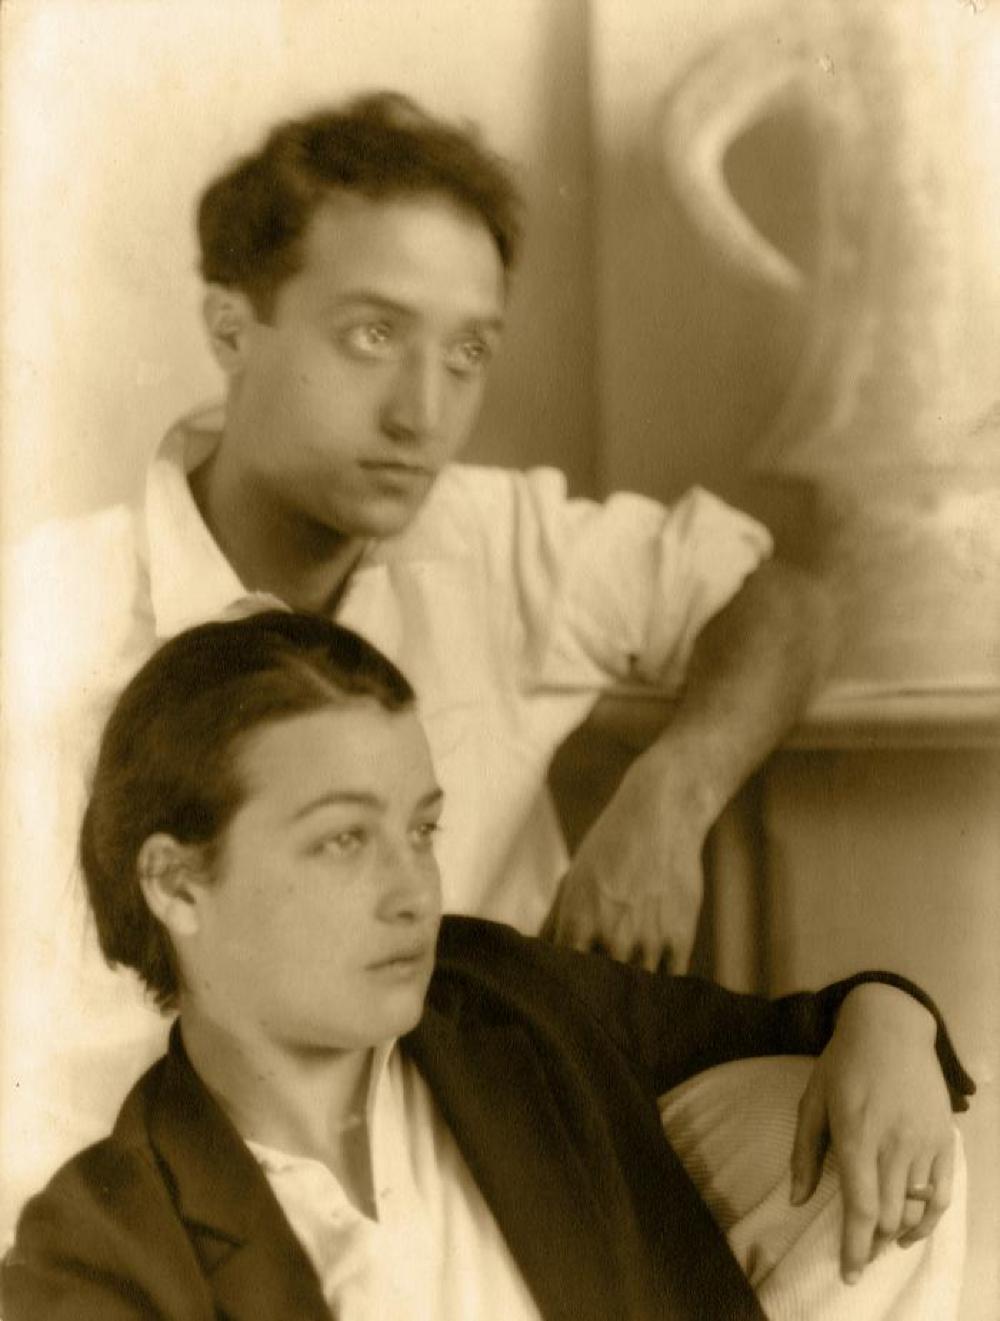 Isamu Noguchi with Marion Greenwood